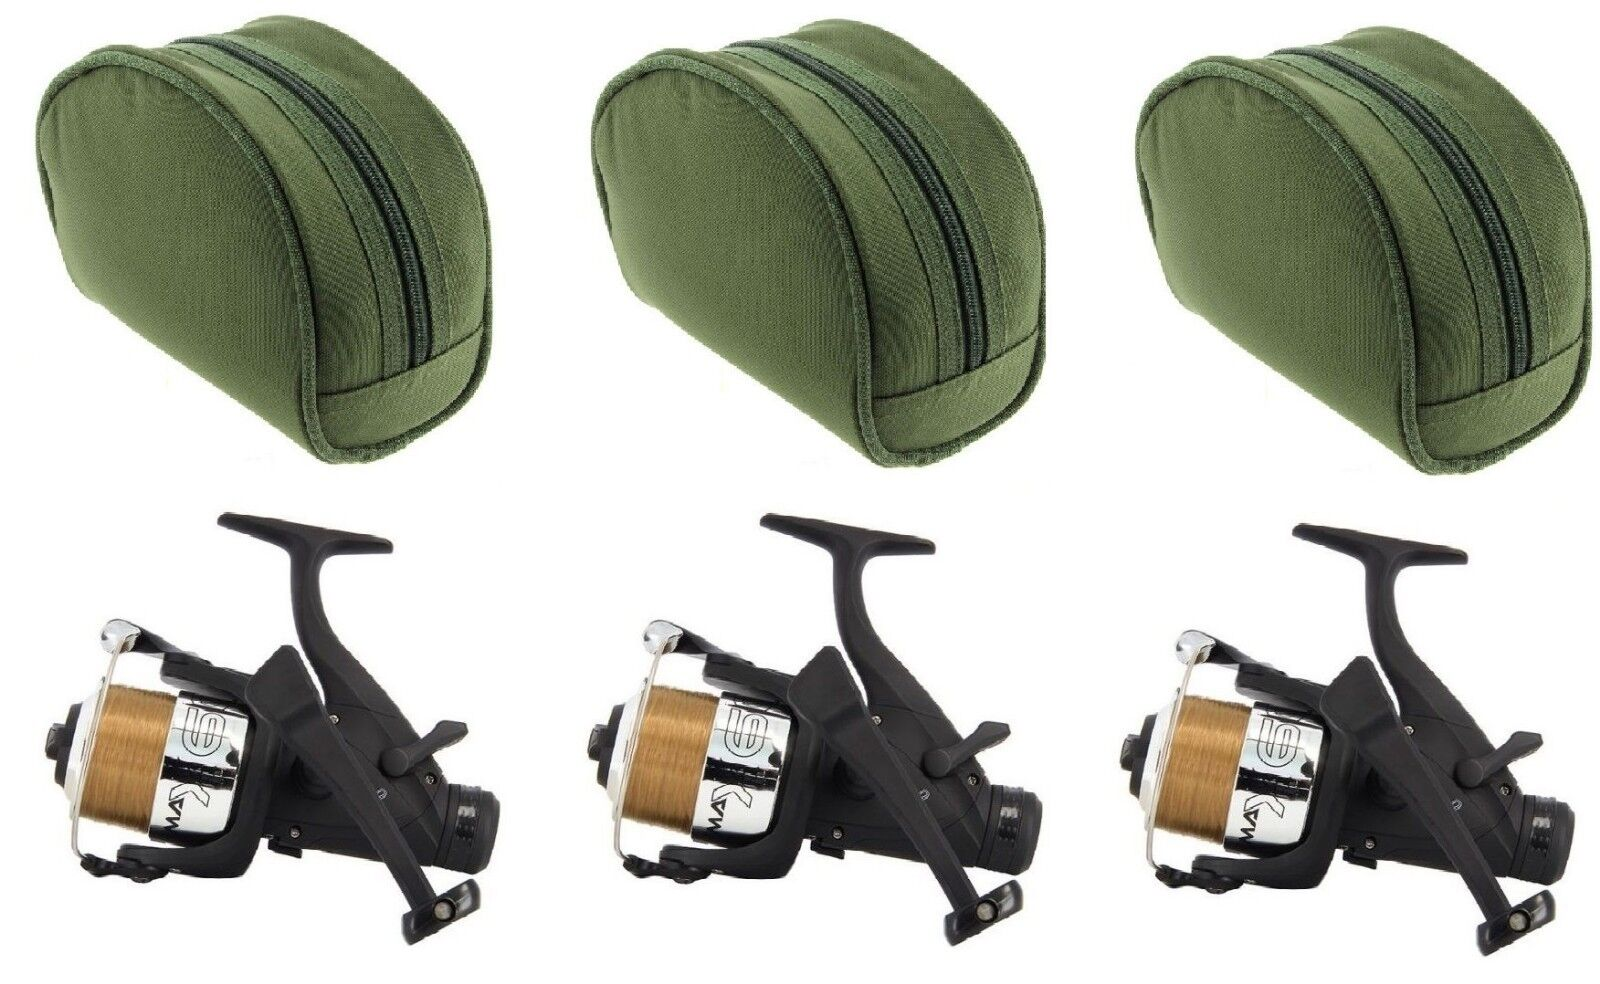 3 x MAX 6000 Size Freespool Carp Fishing Reels Bait Switch Runner Reels & Cases